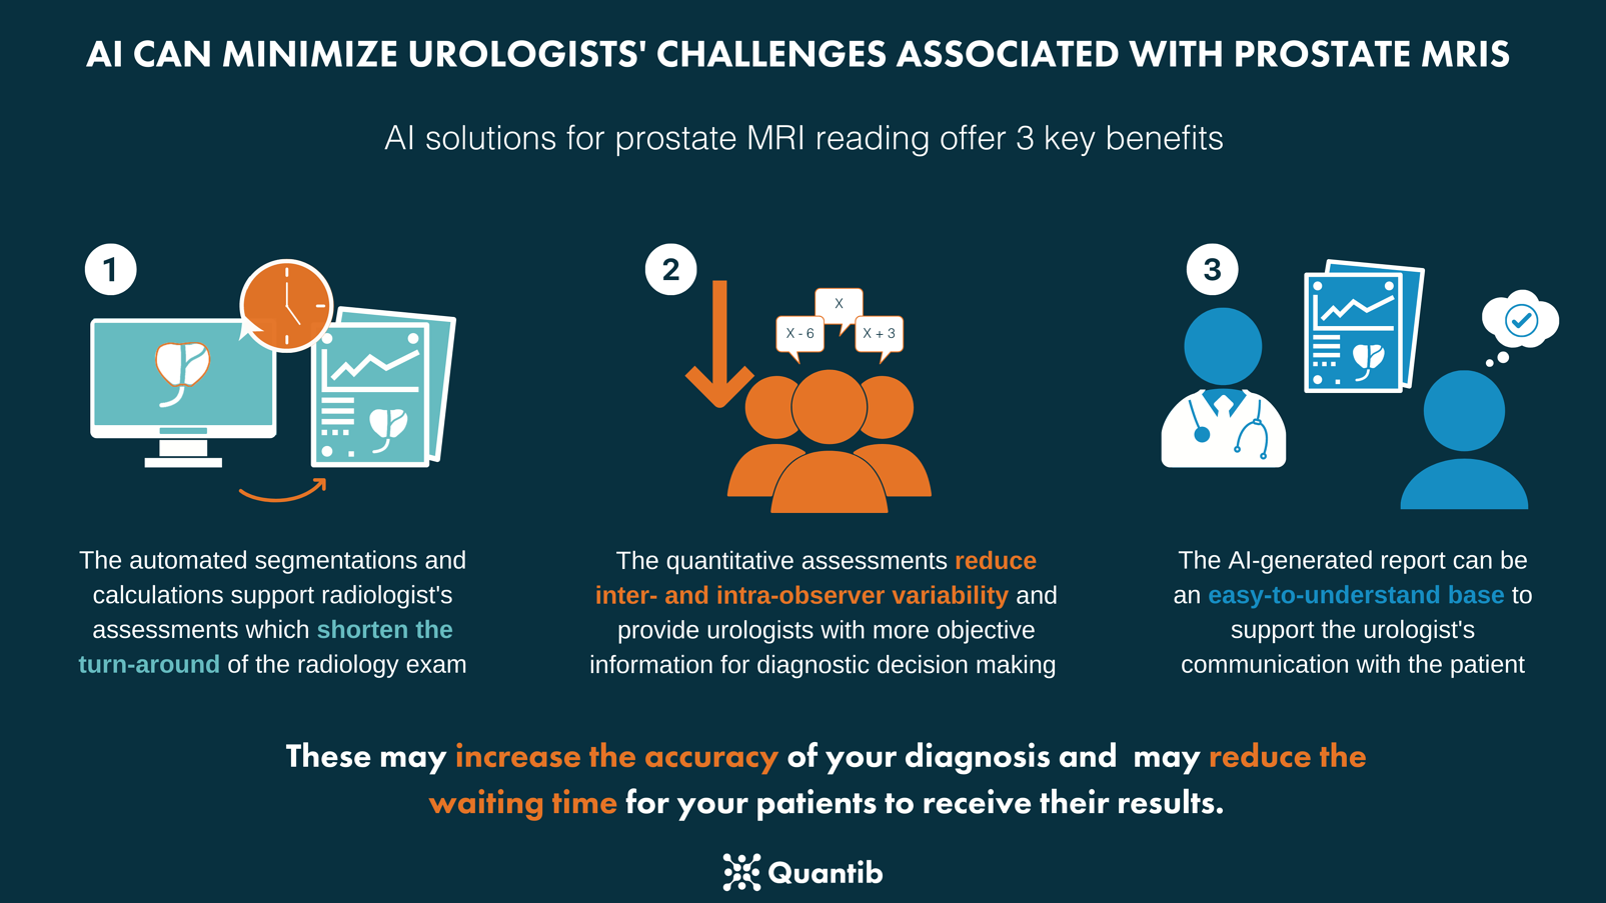 210803 - Infographic AI minimizes urologists challenges